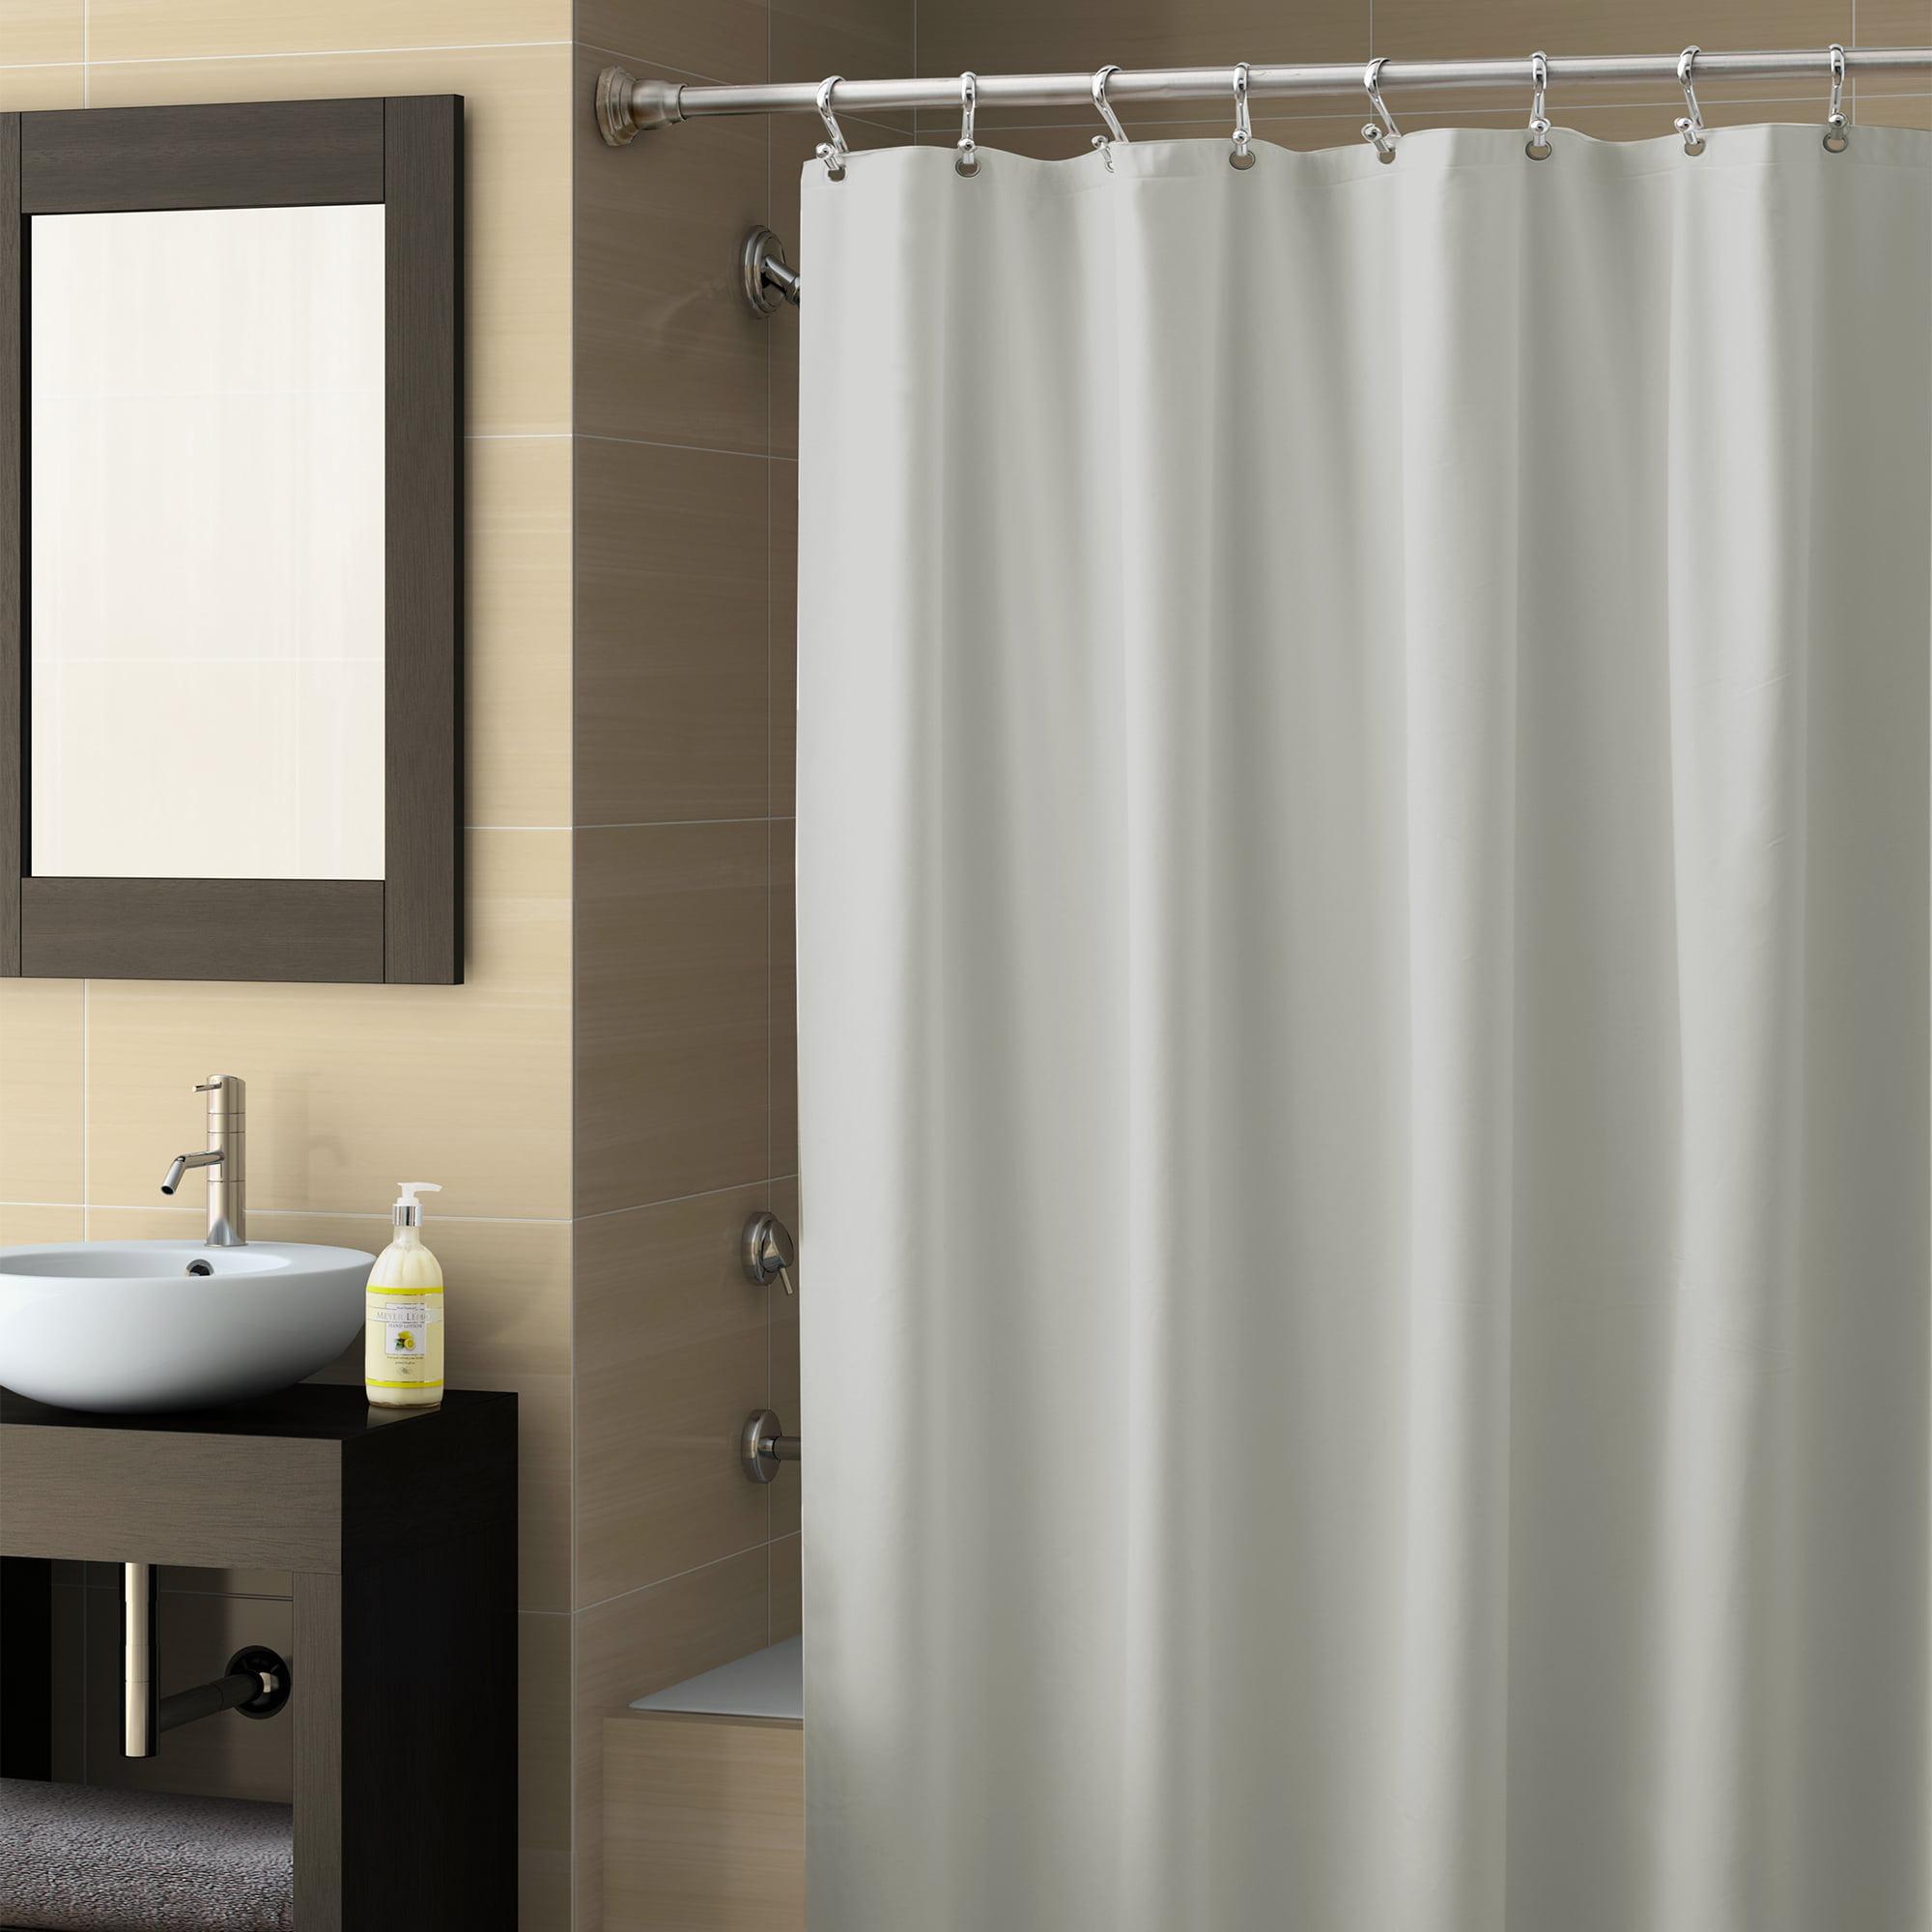 "Better Homes and Gardens PEVA Heavyweight Shower Liner Grey 70"" x 72"""